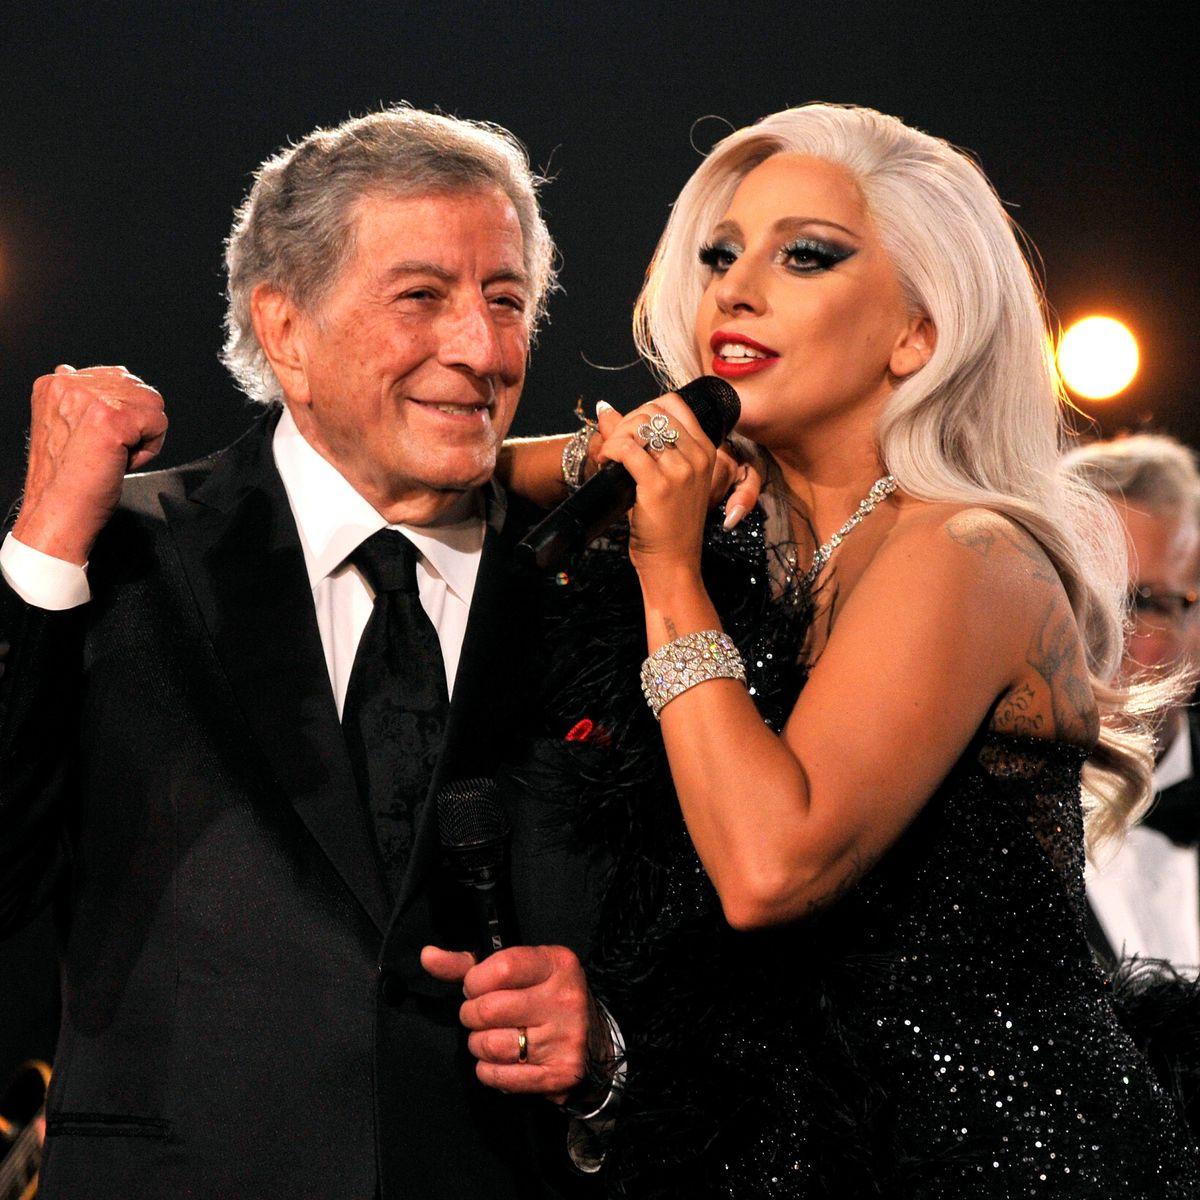 Tony Bennett Announces Final Performance with Lady Gaga